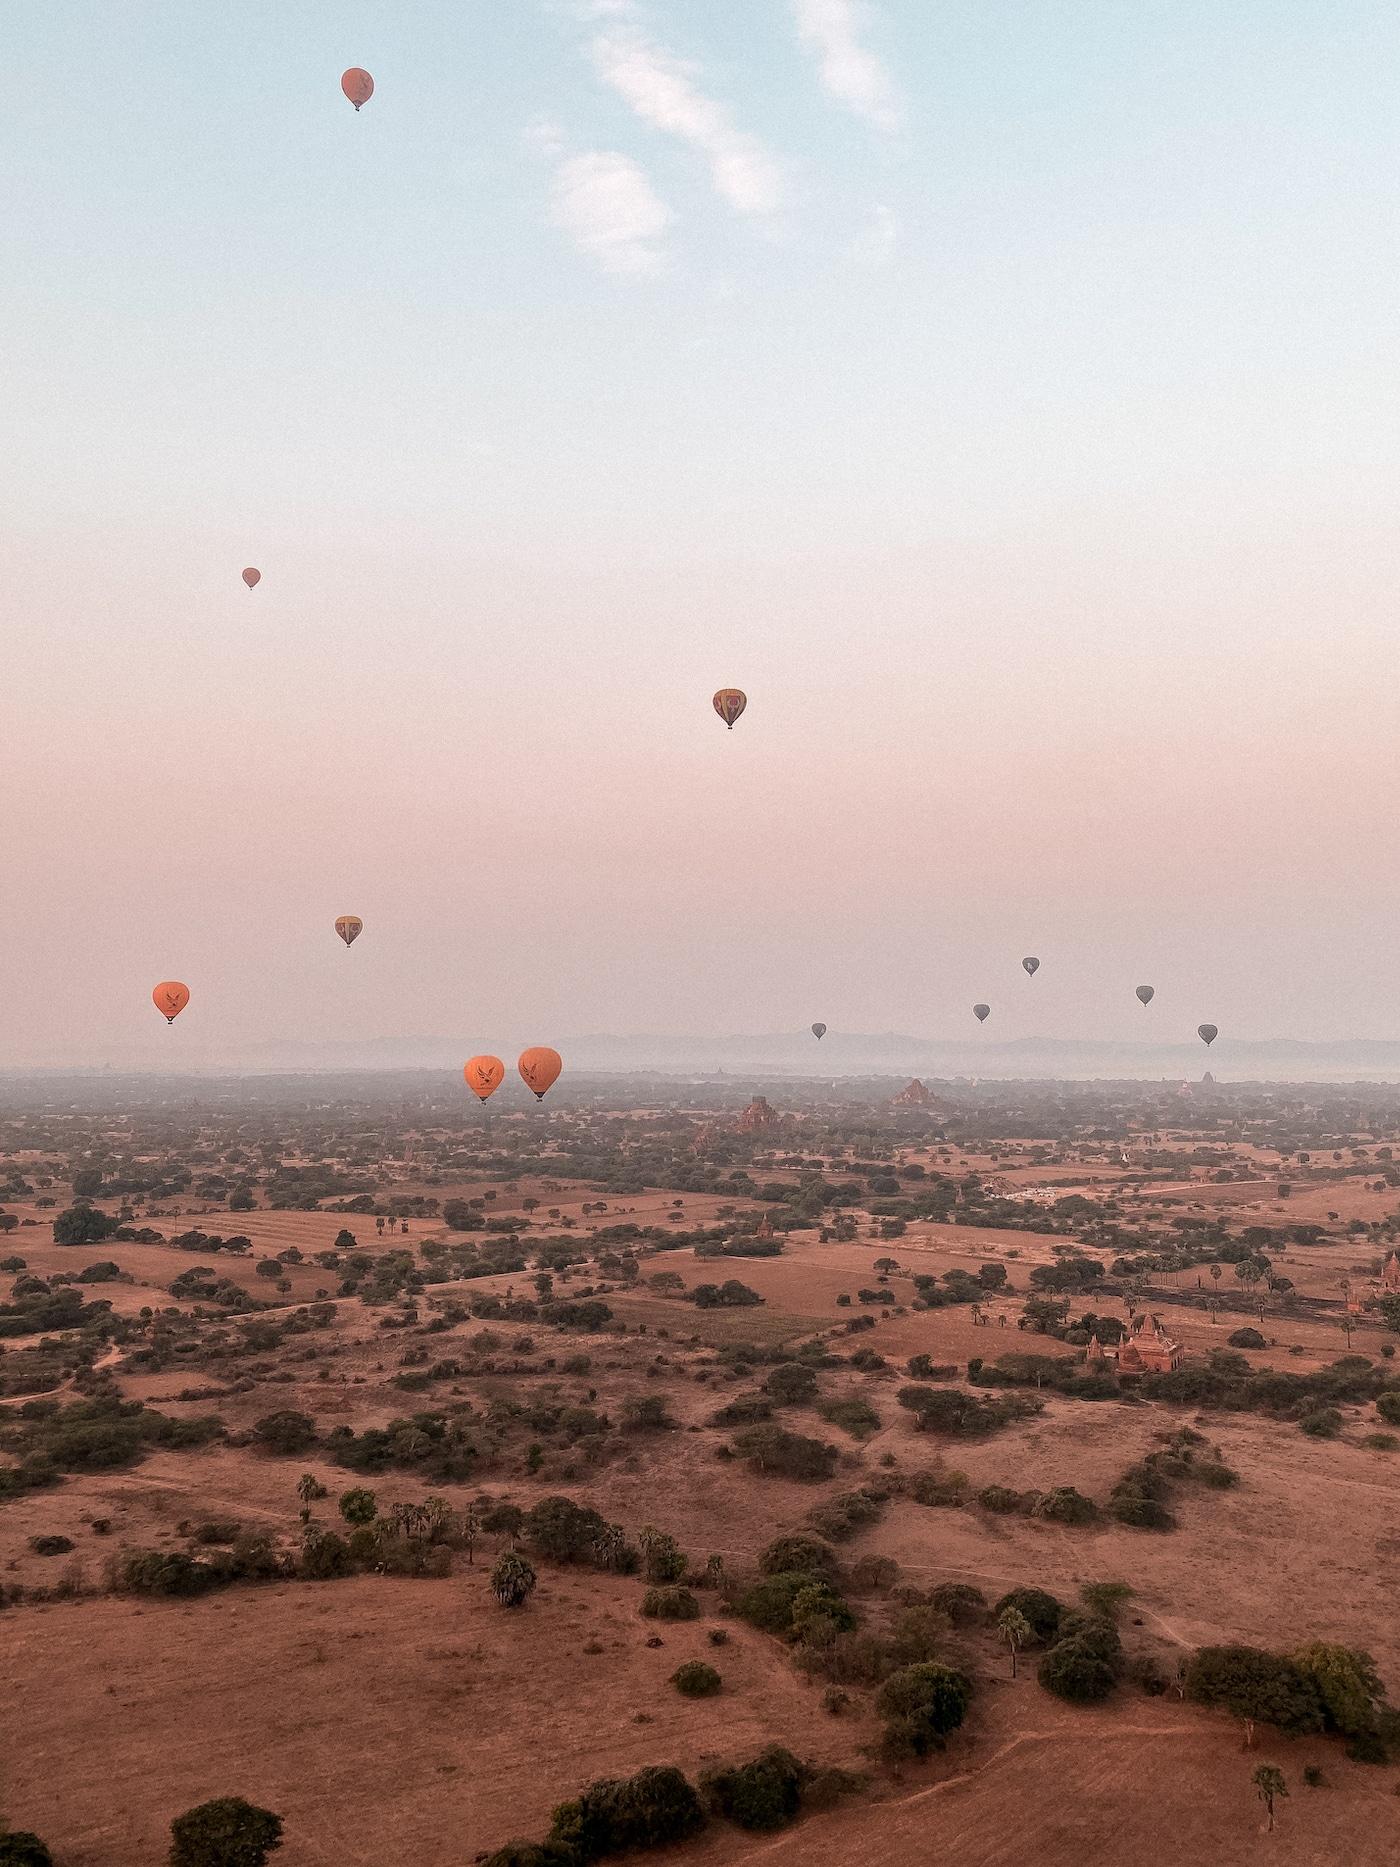 Ballonfahrt über Bagan Aussicht